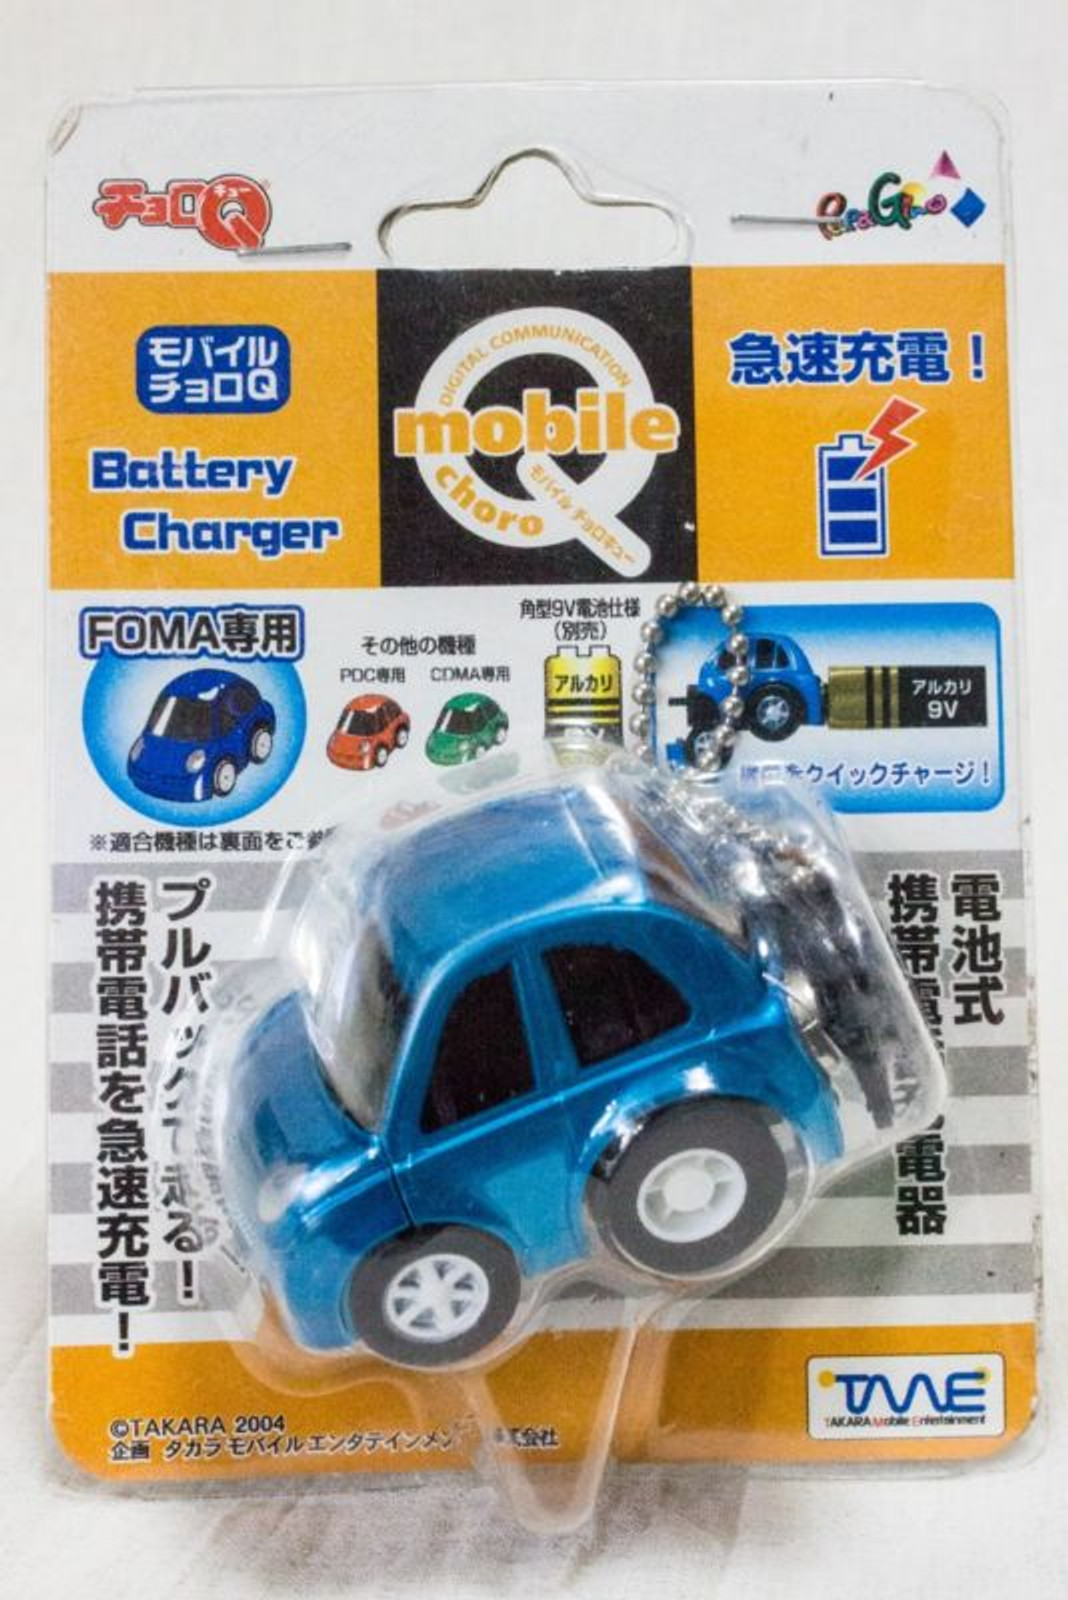 Mobile Choro Q Battery Charger Key Chain TAKARA JAPAN CAR FIGURE